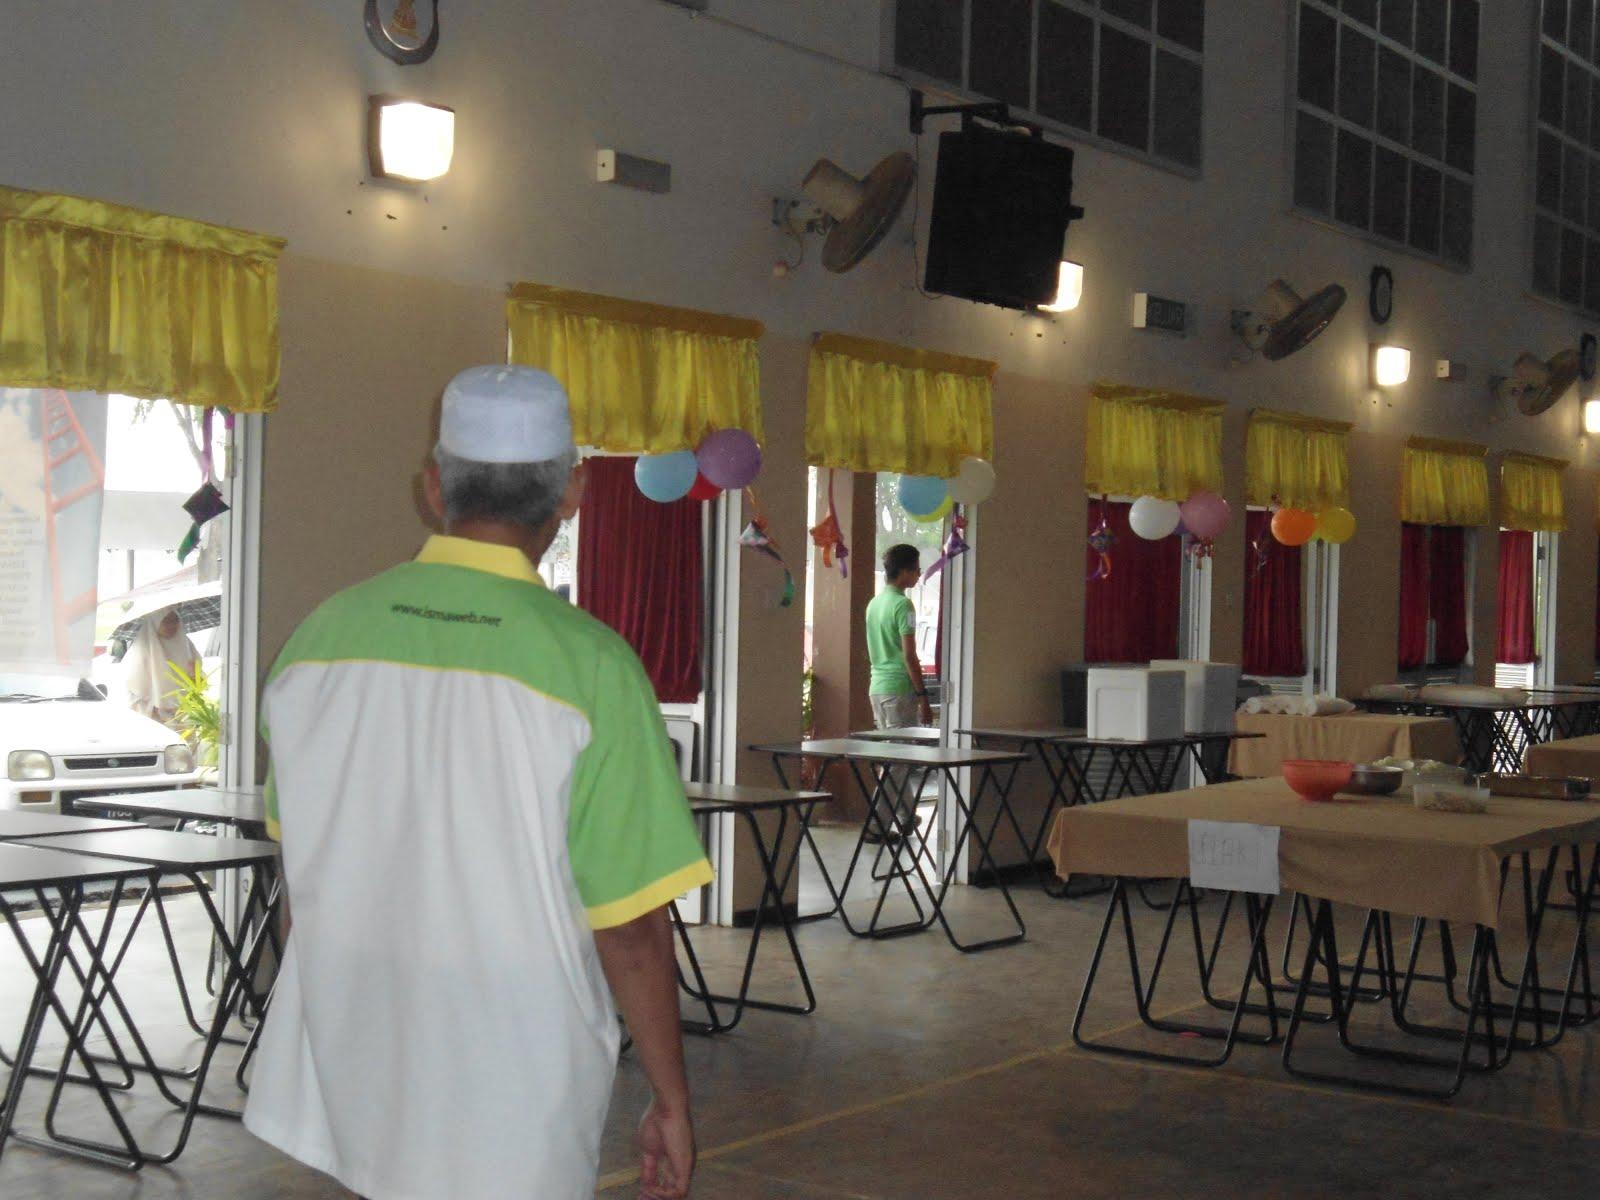 Majlis Raya ISMA Kuala Terengganu 2012 | Ikatan Muslimin Malaysia